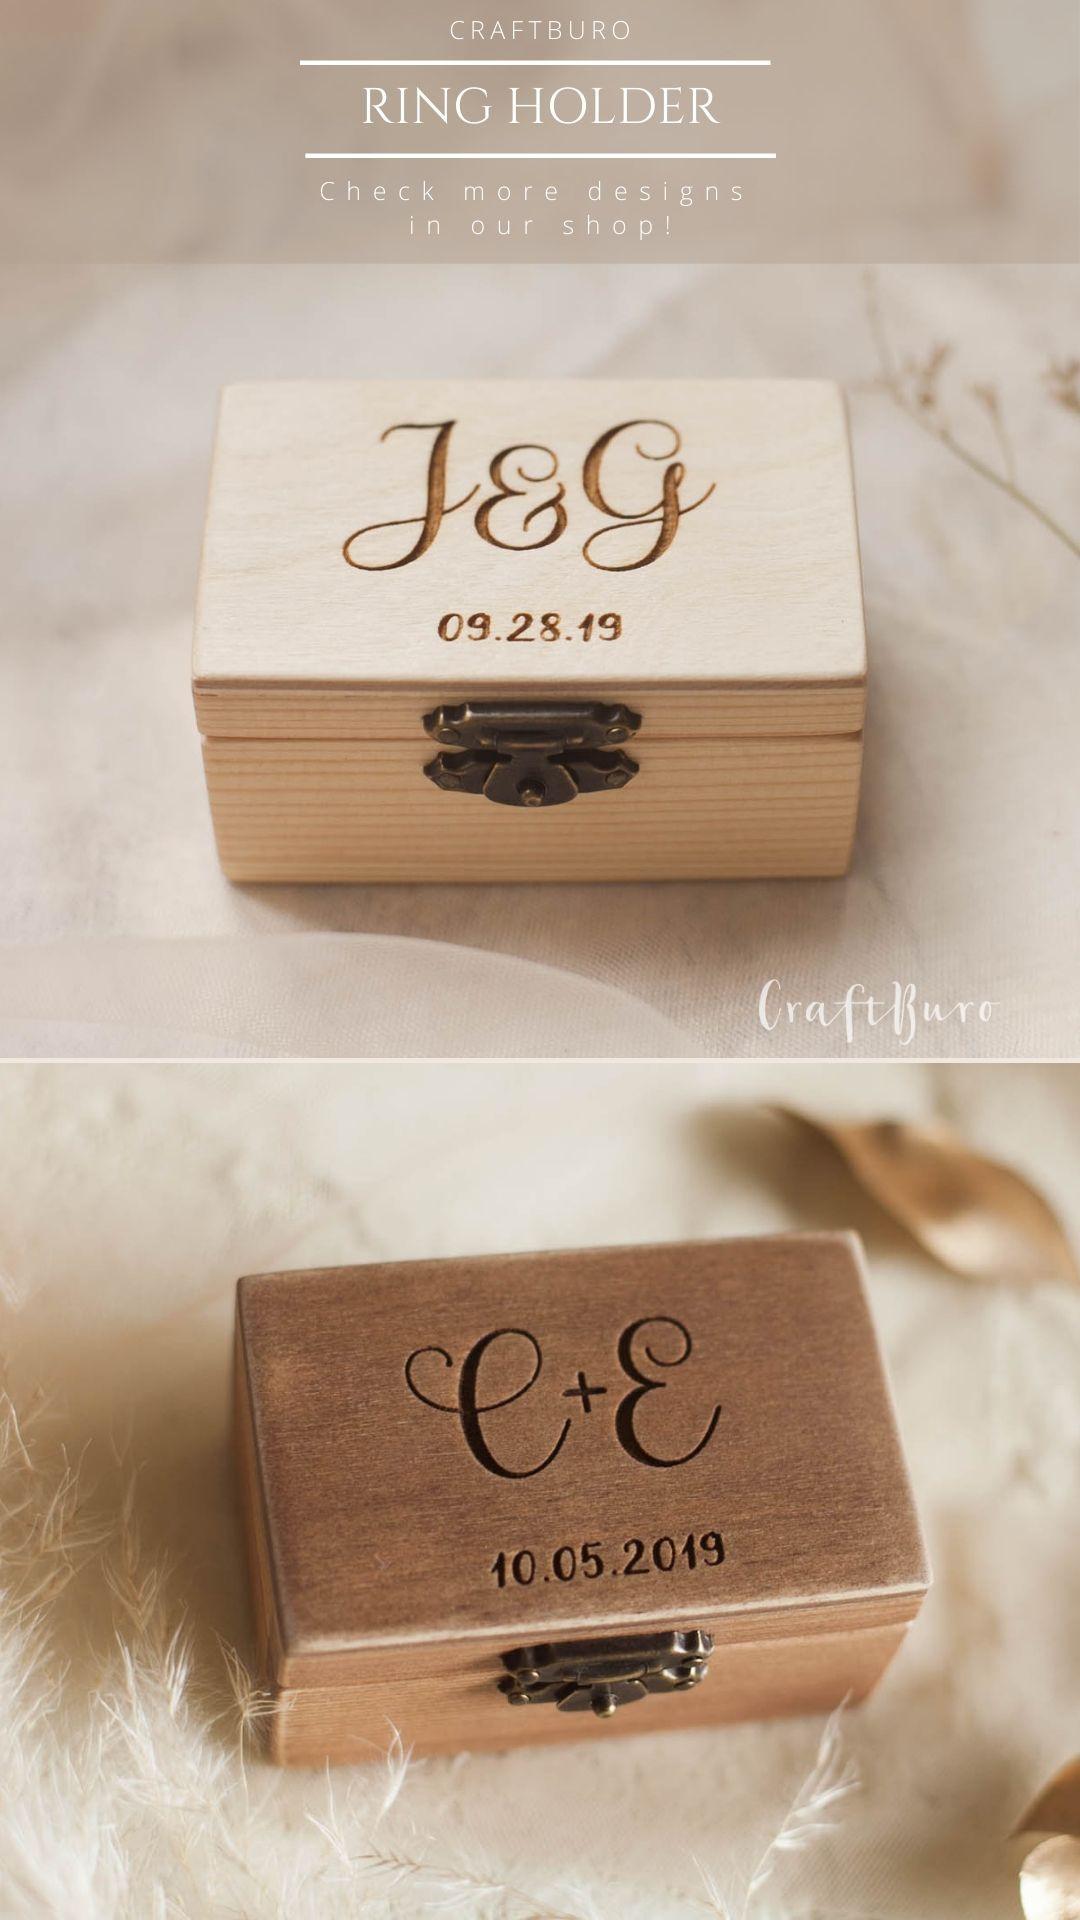 Ring Bearer Box Wedding Ring Box For Ceremony Wedding Ring Etsy In 2020 Wedding Ring Box Ring Bearer Box Ring Holder Wedding